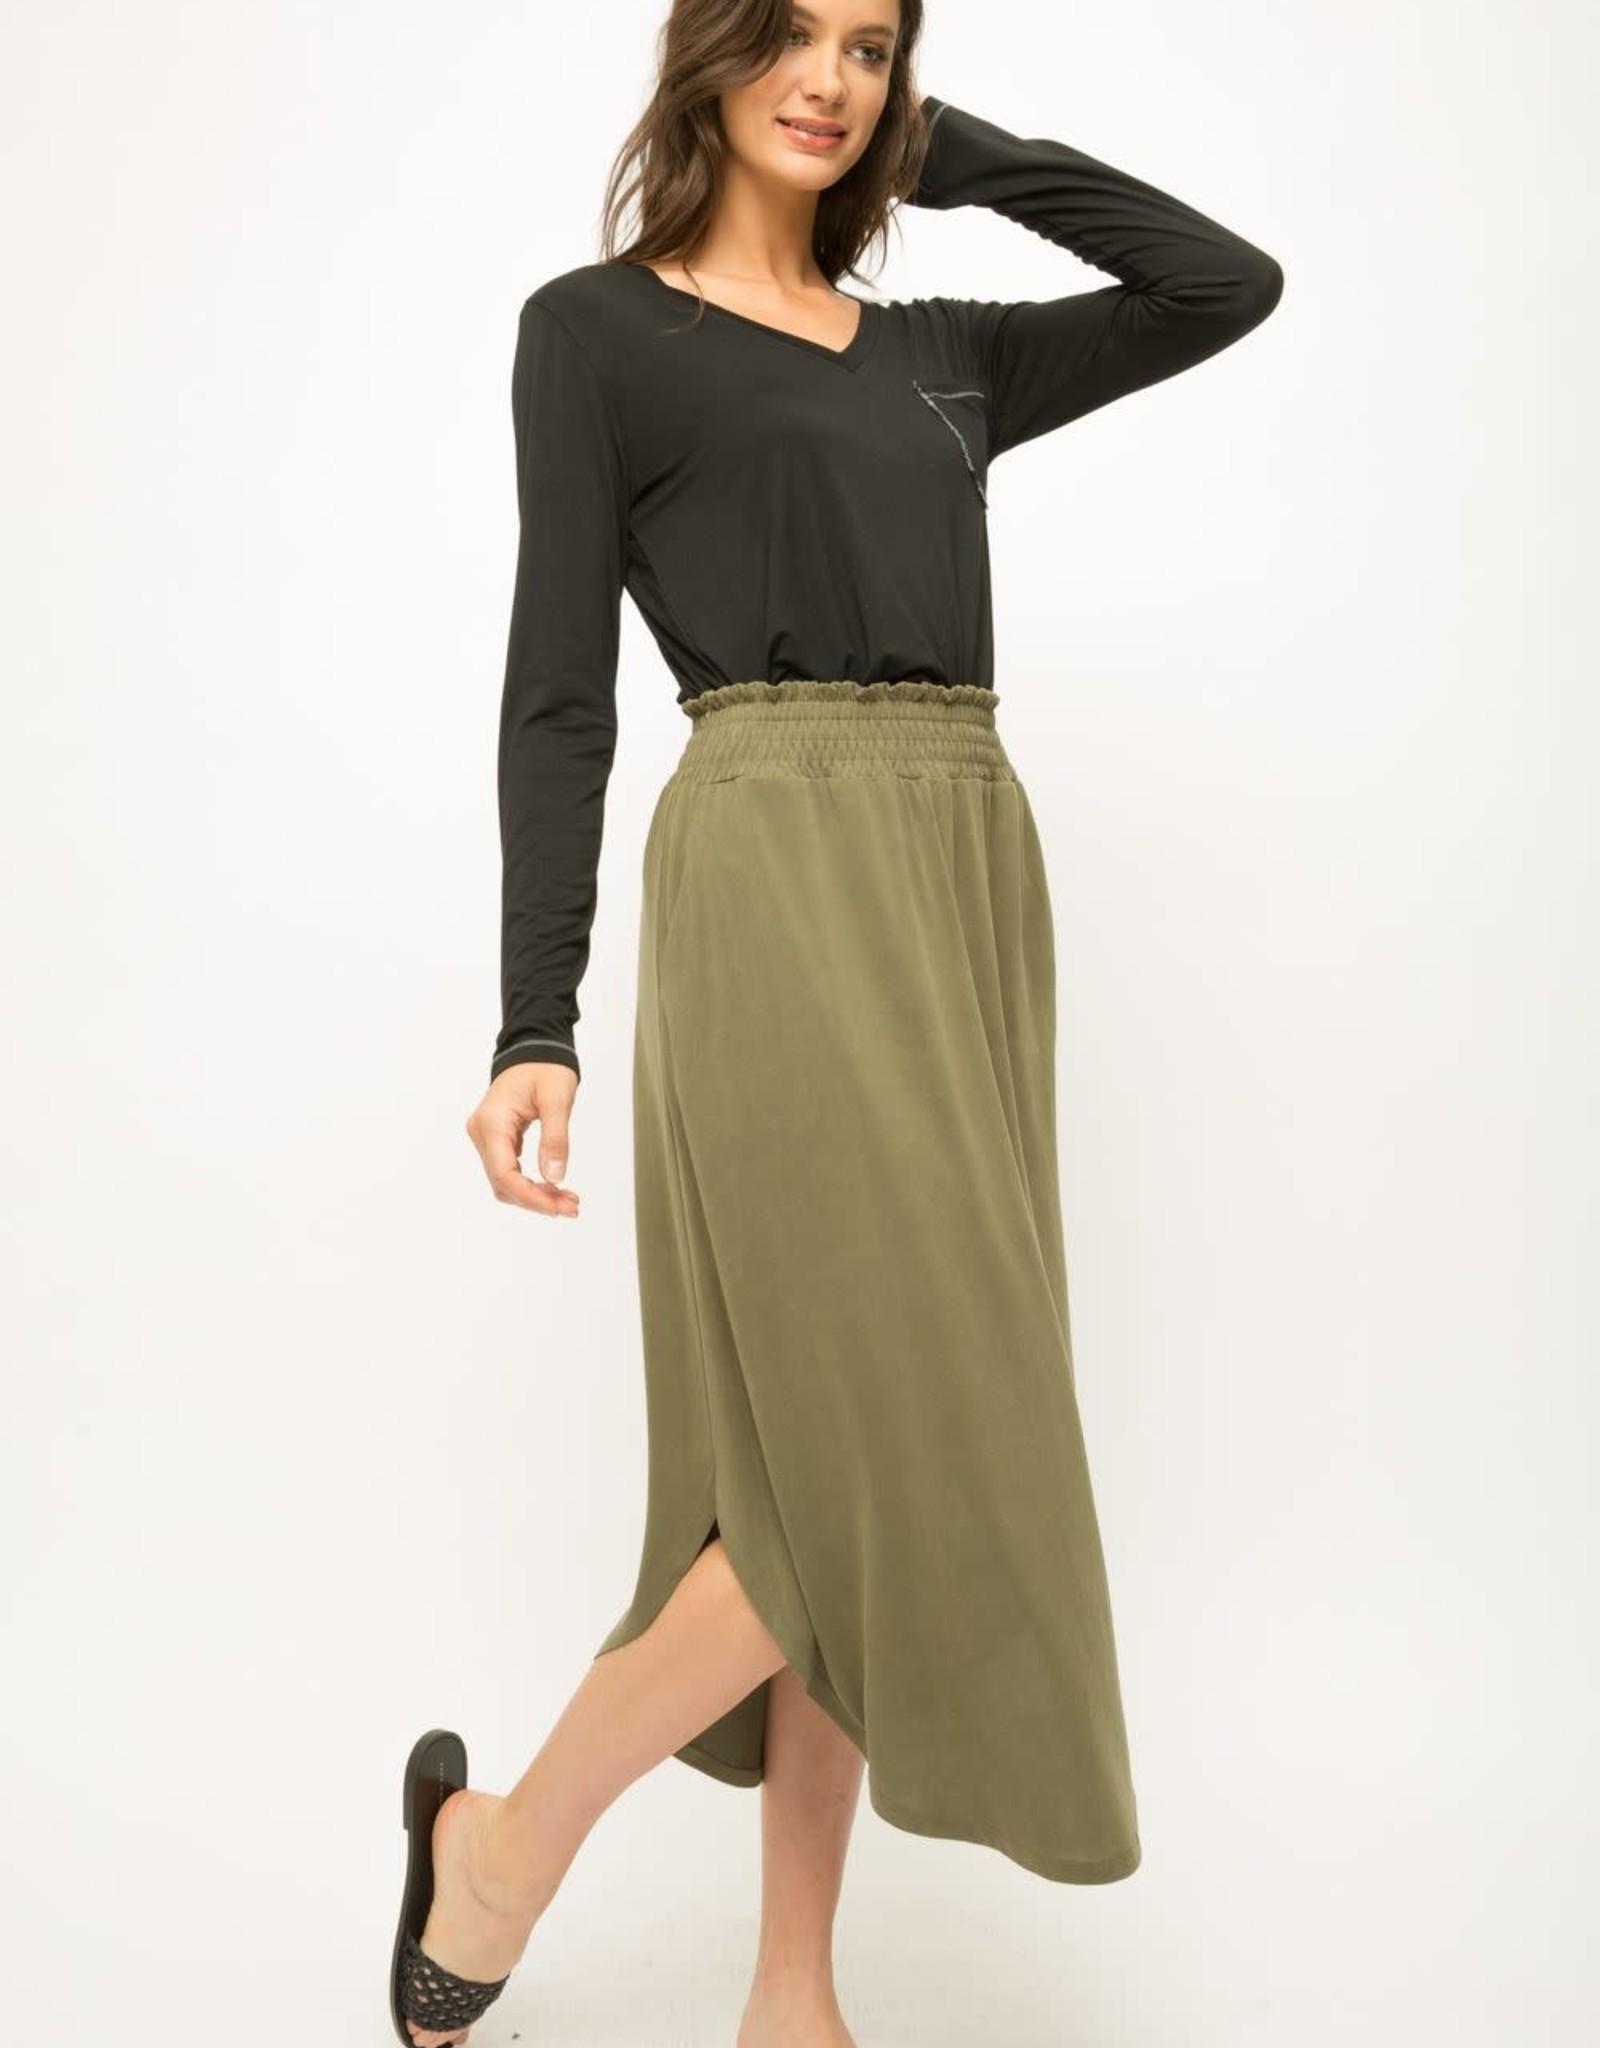 Smocked olive skirt